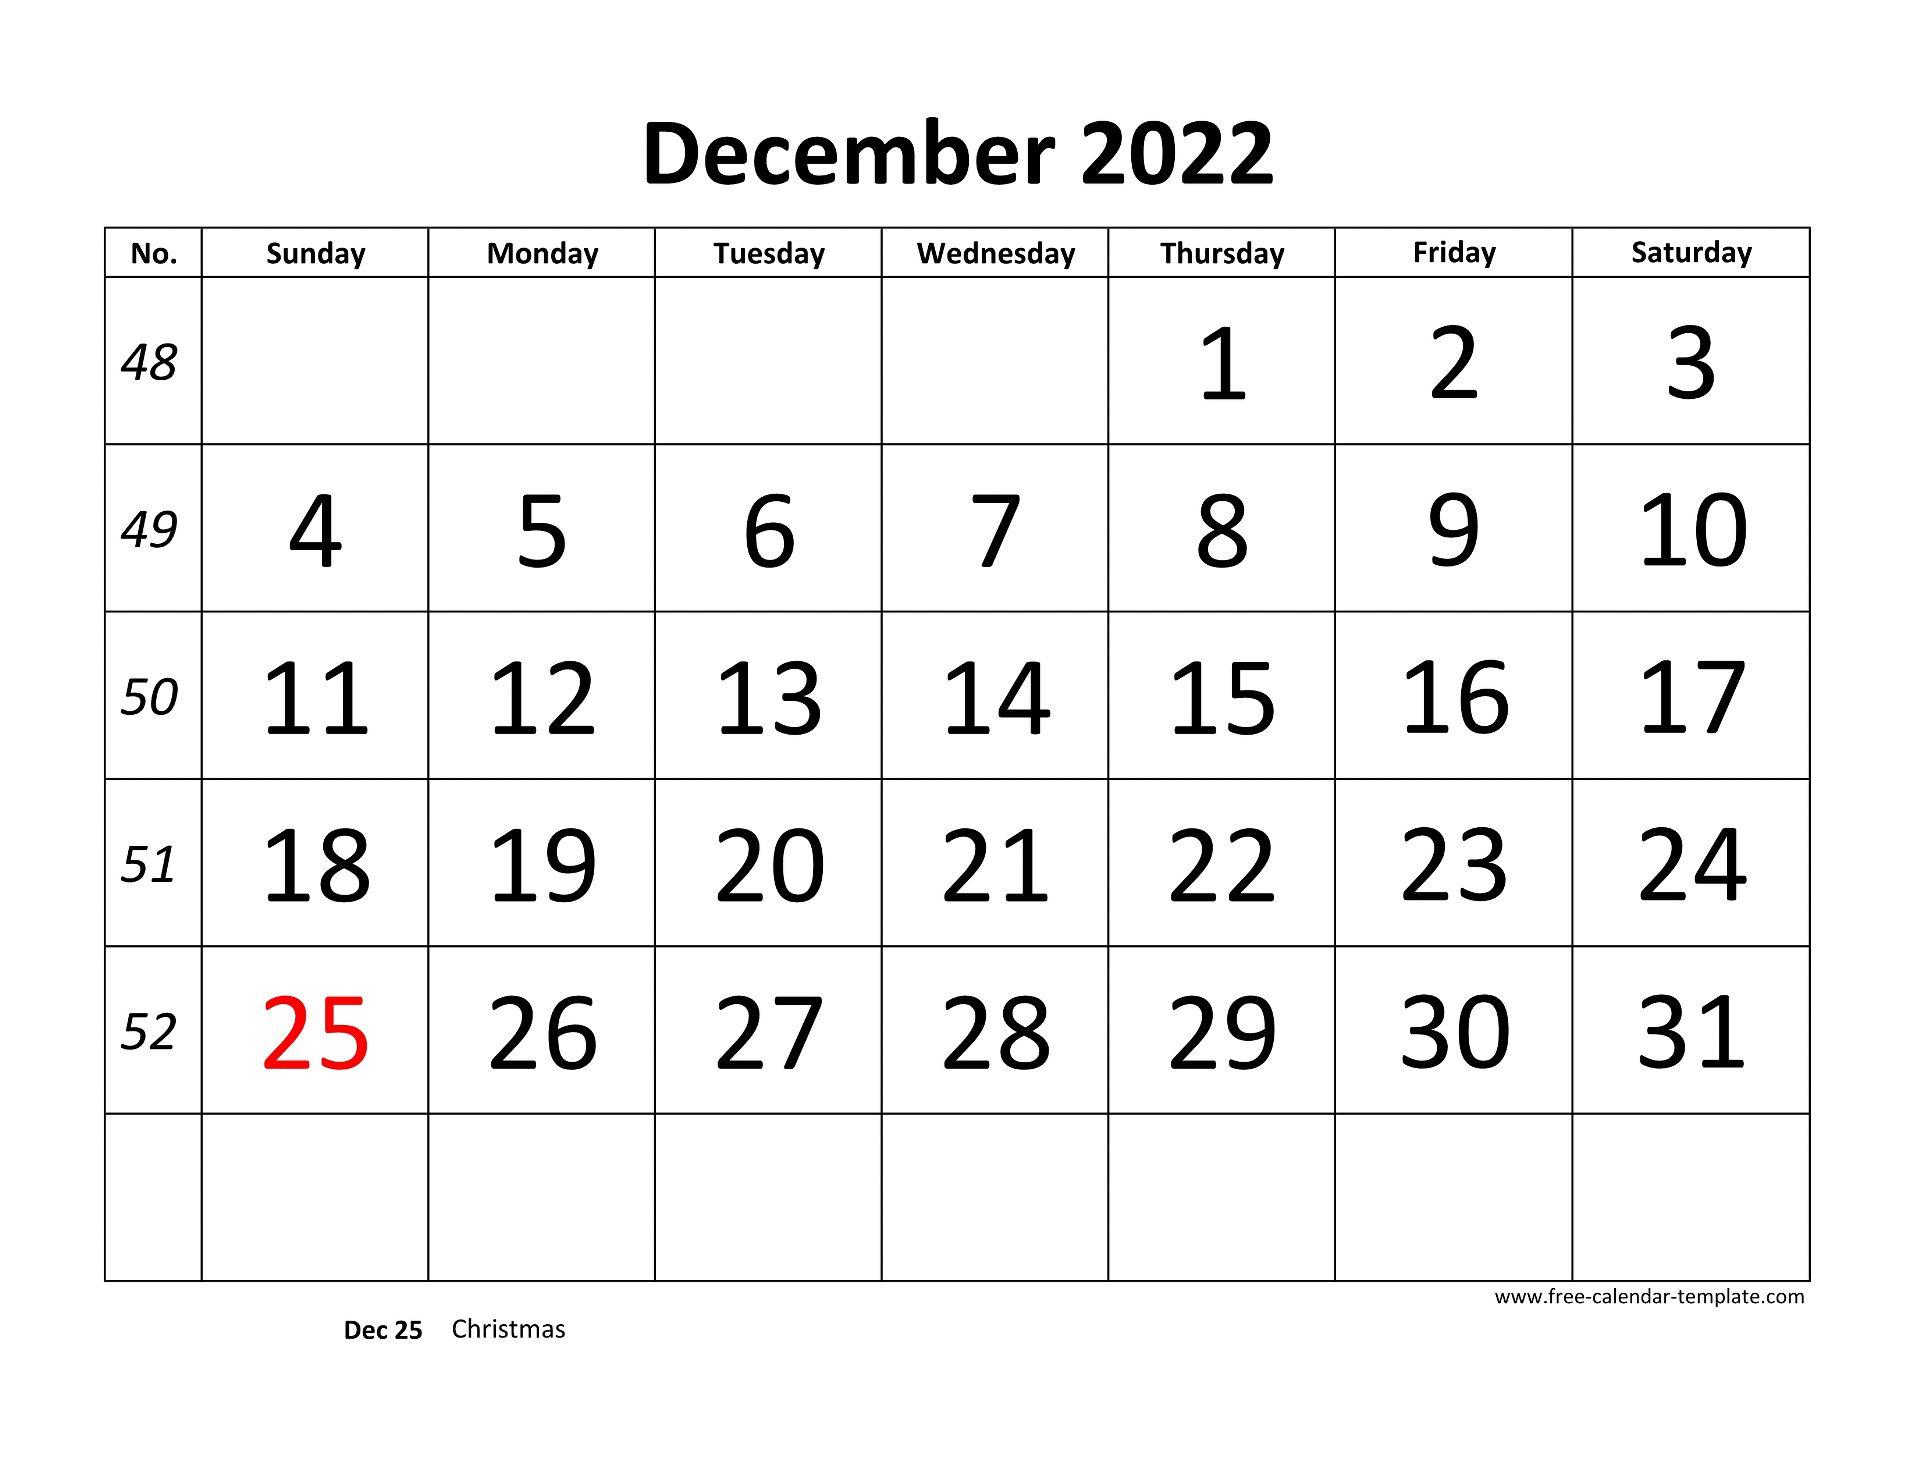 Calendar For December 2022.December 2022 Calendar Designed With Large Font Horizontal Free Calendar Template Com